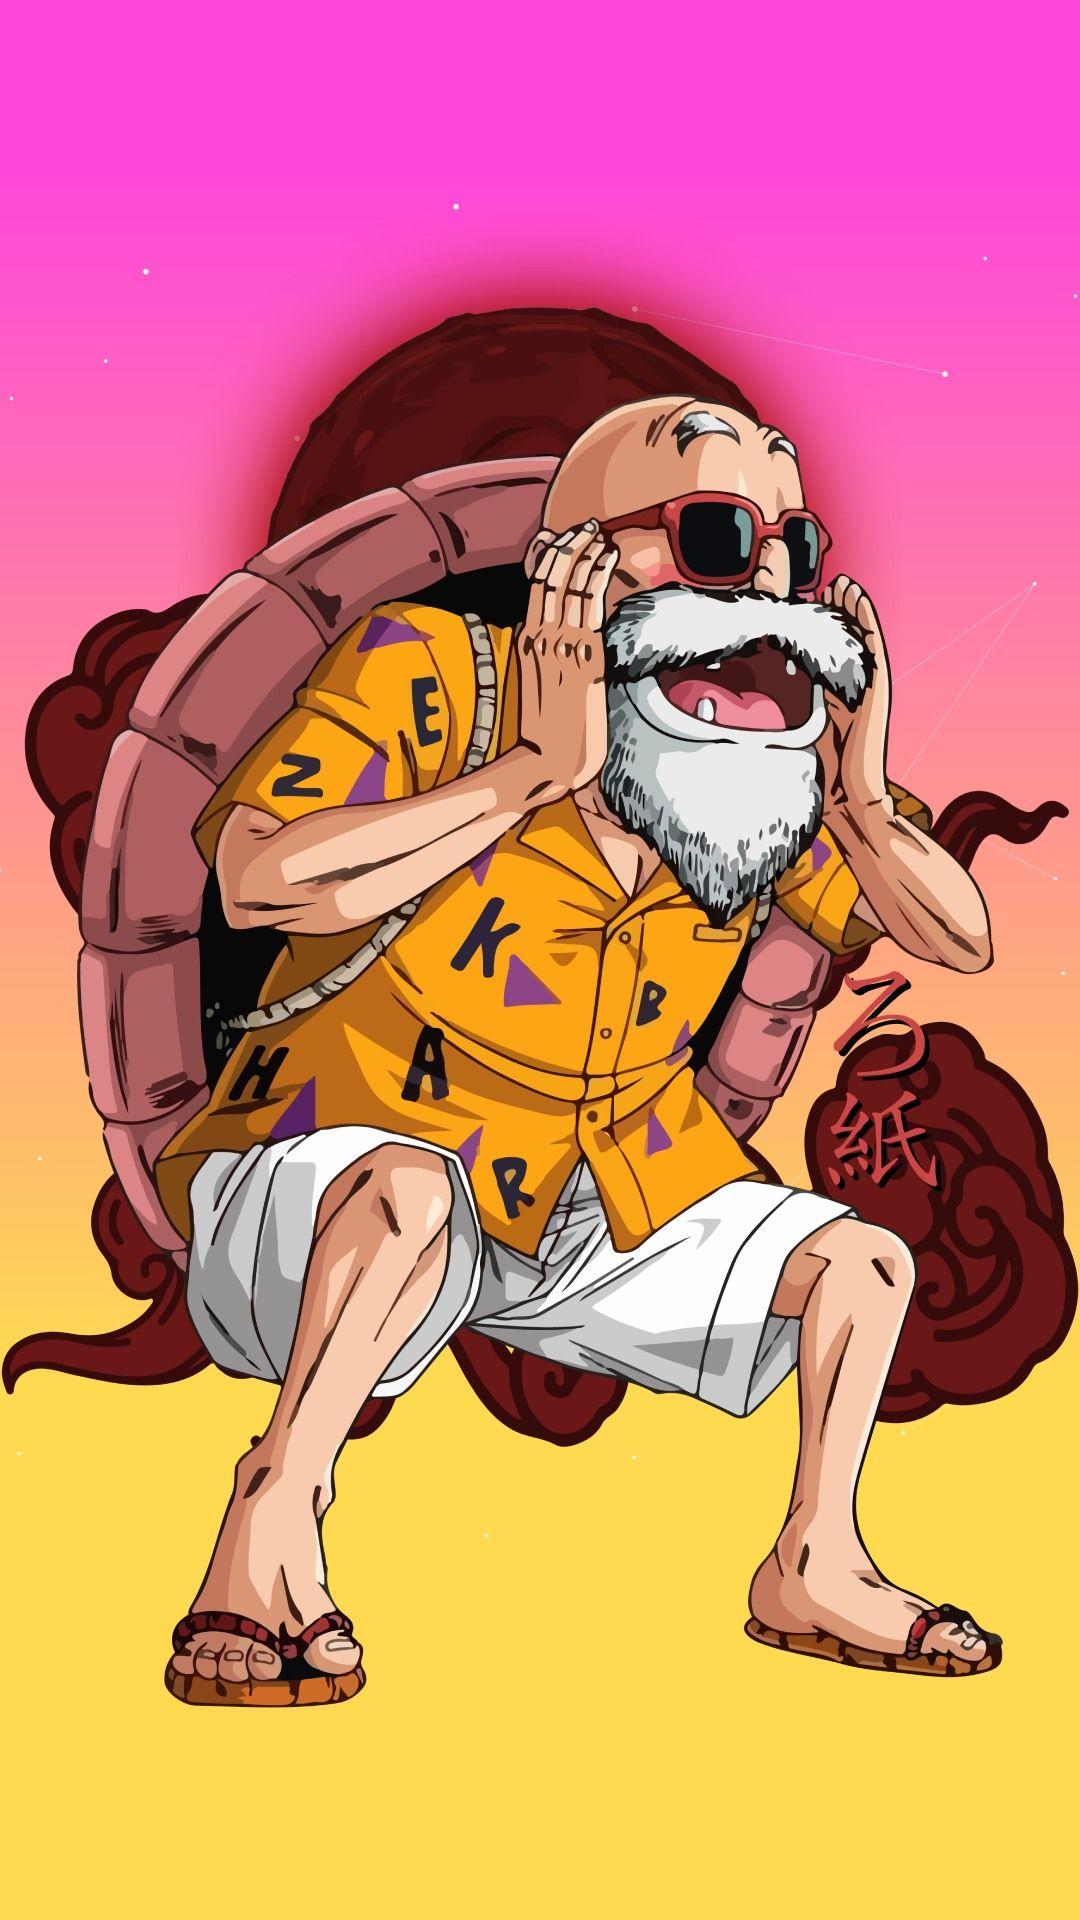 Master Roshi Dragon Ball In 2021 Anime Anime Guys Manga Drawing